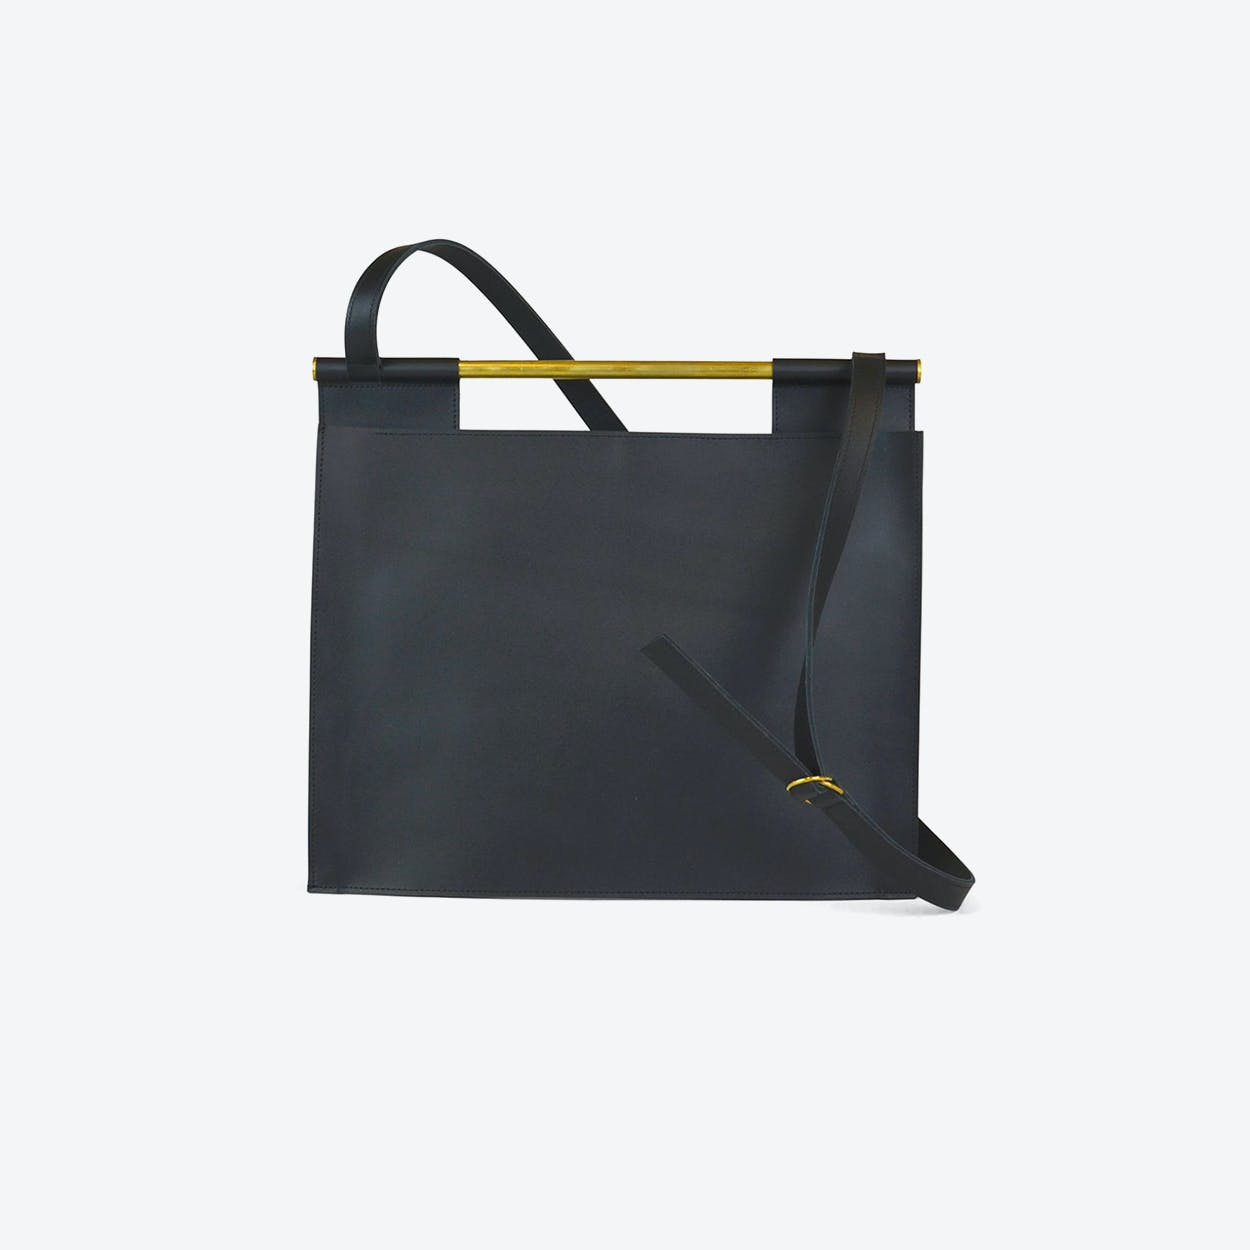 Workbag Frame - Black